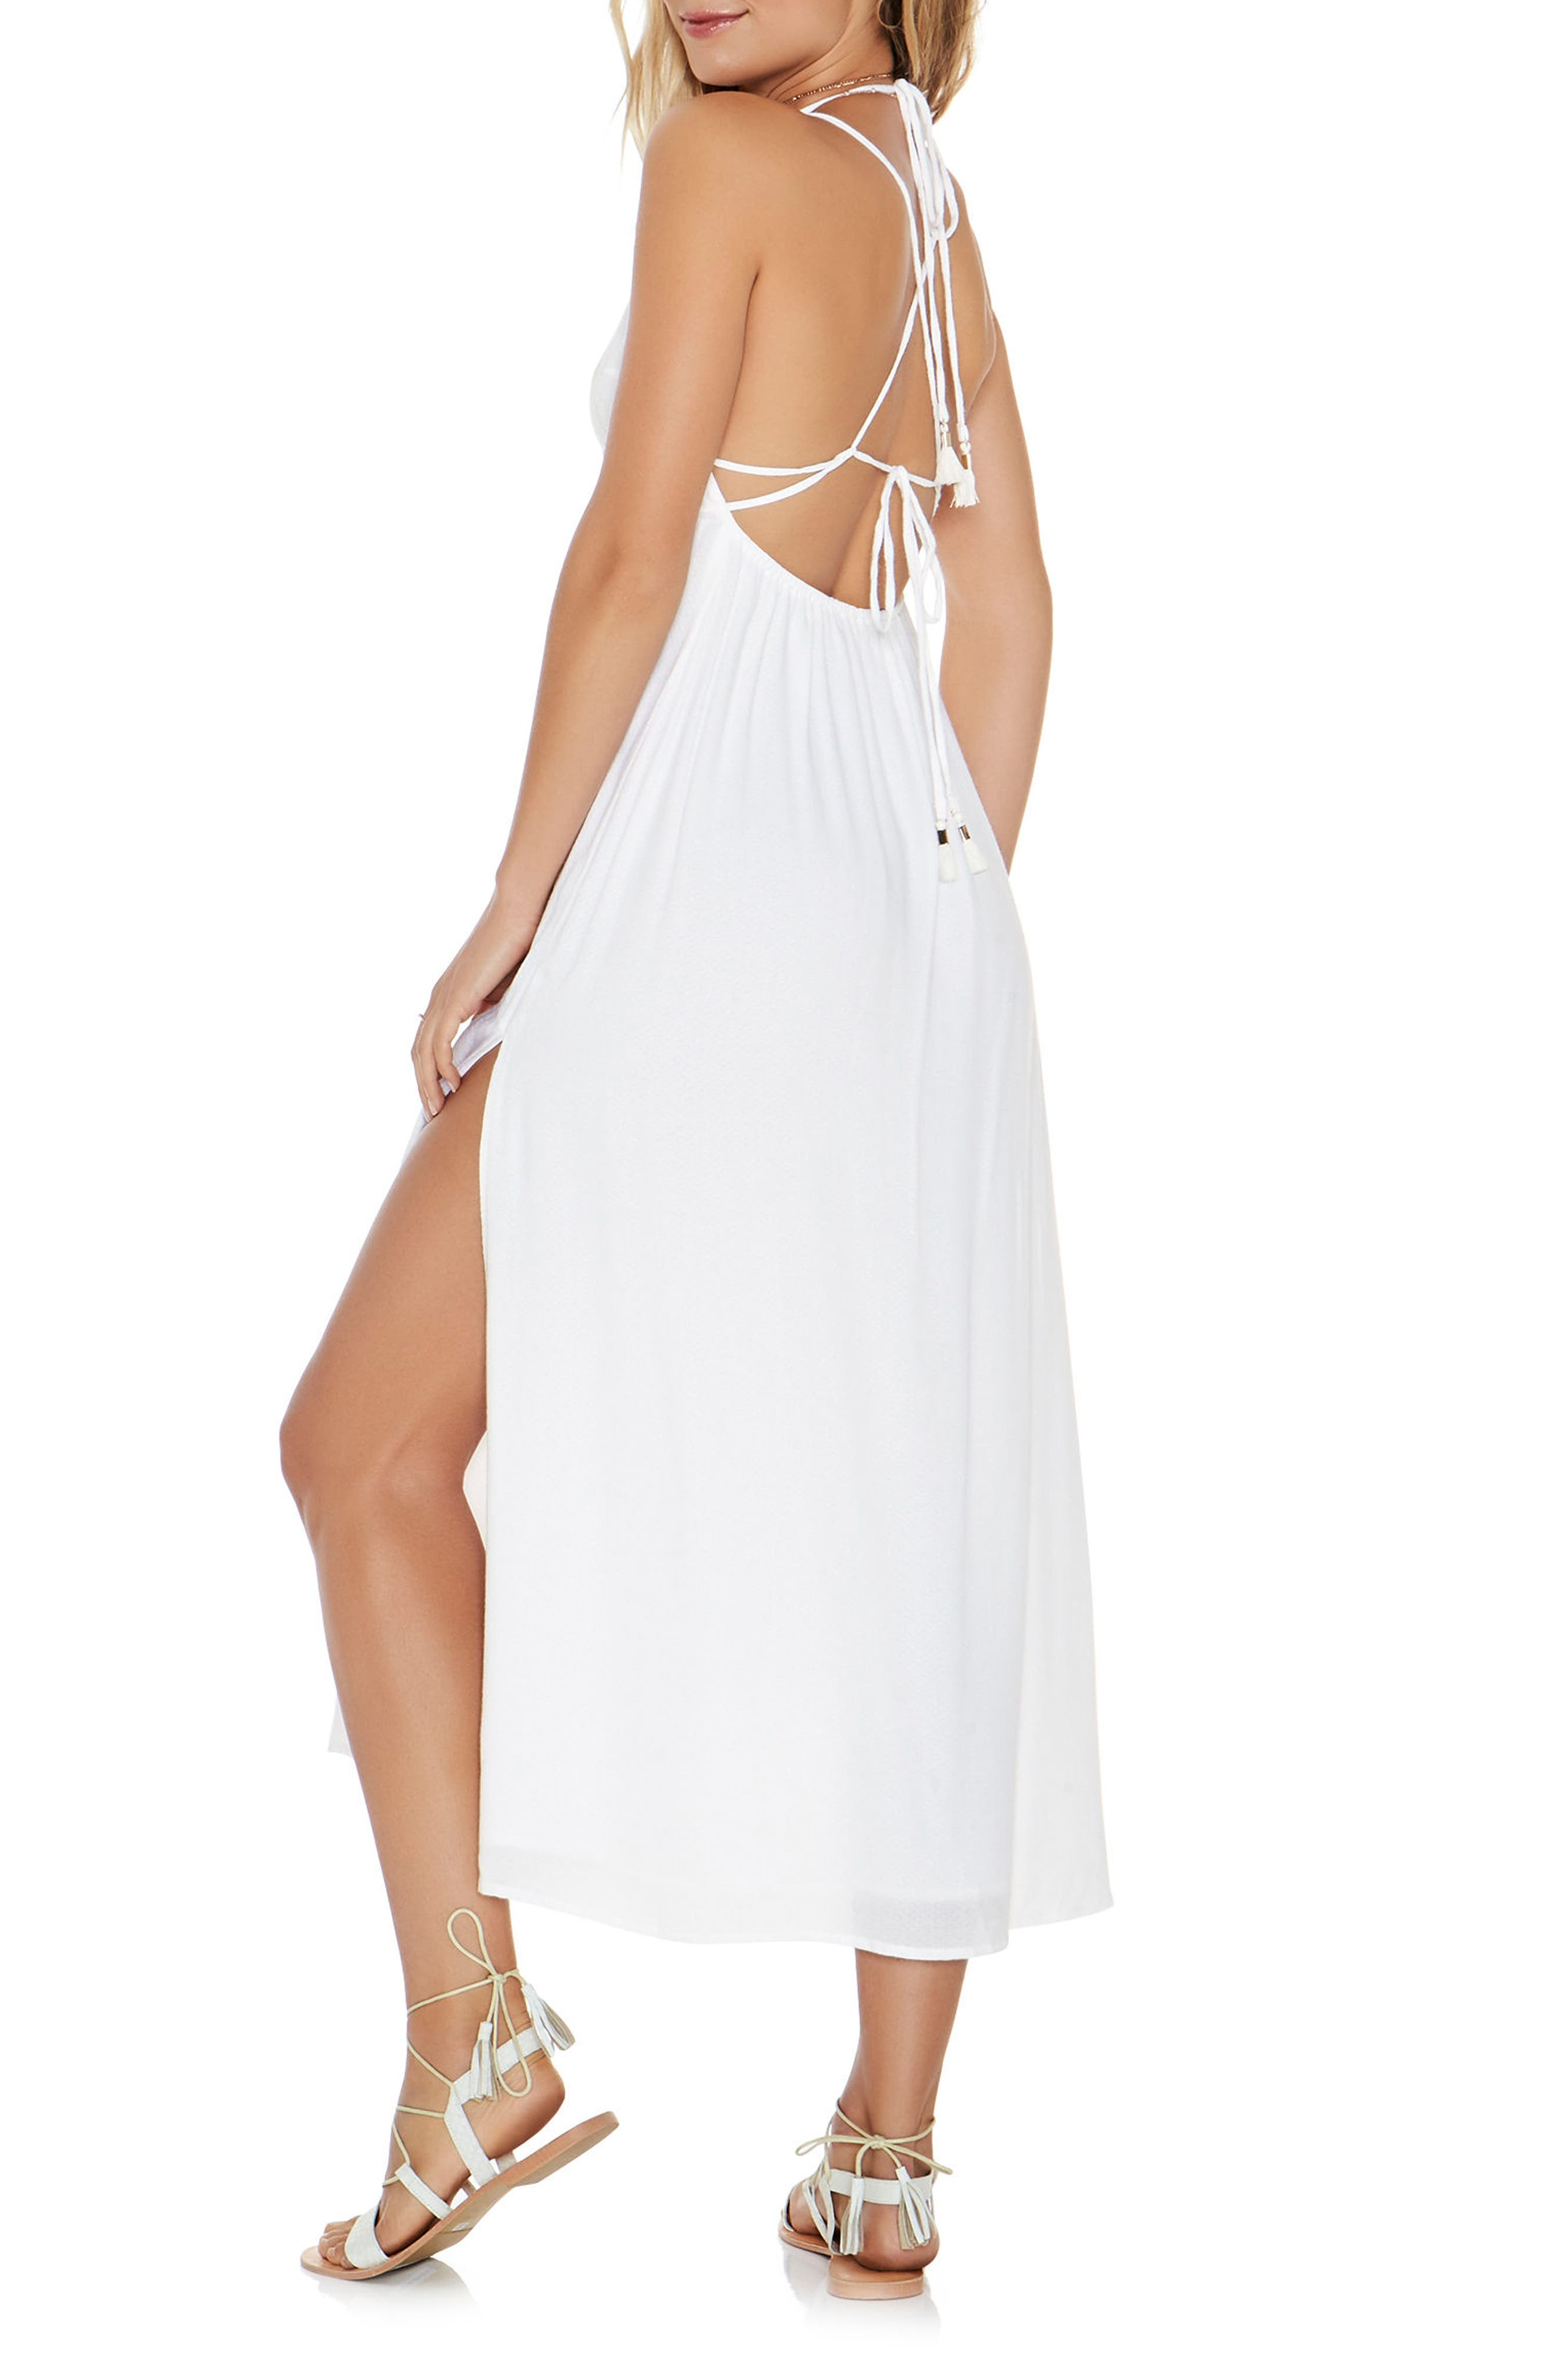 Beachside Beauty Cover-Up Dress,                             Alternate thumbnail 3, color,                             White